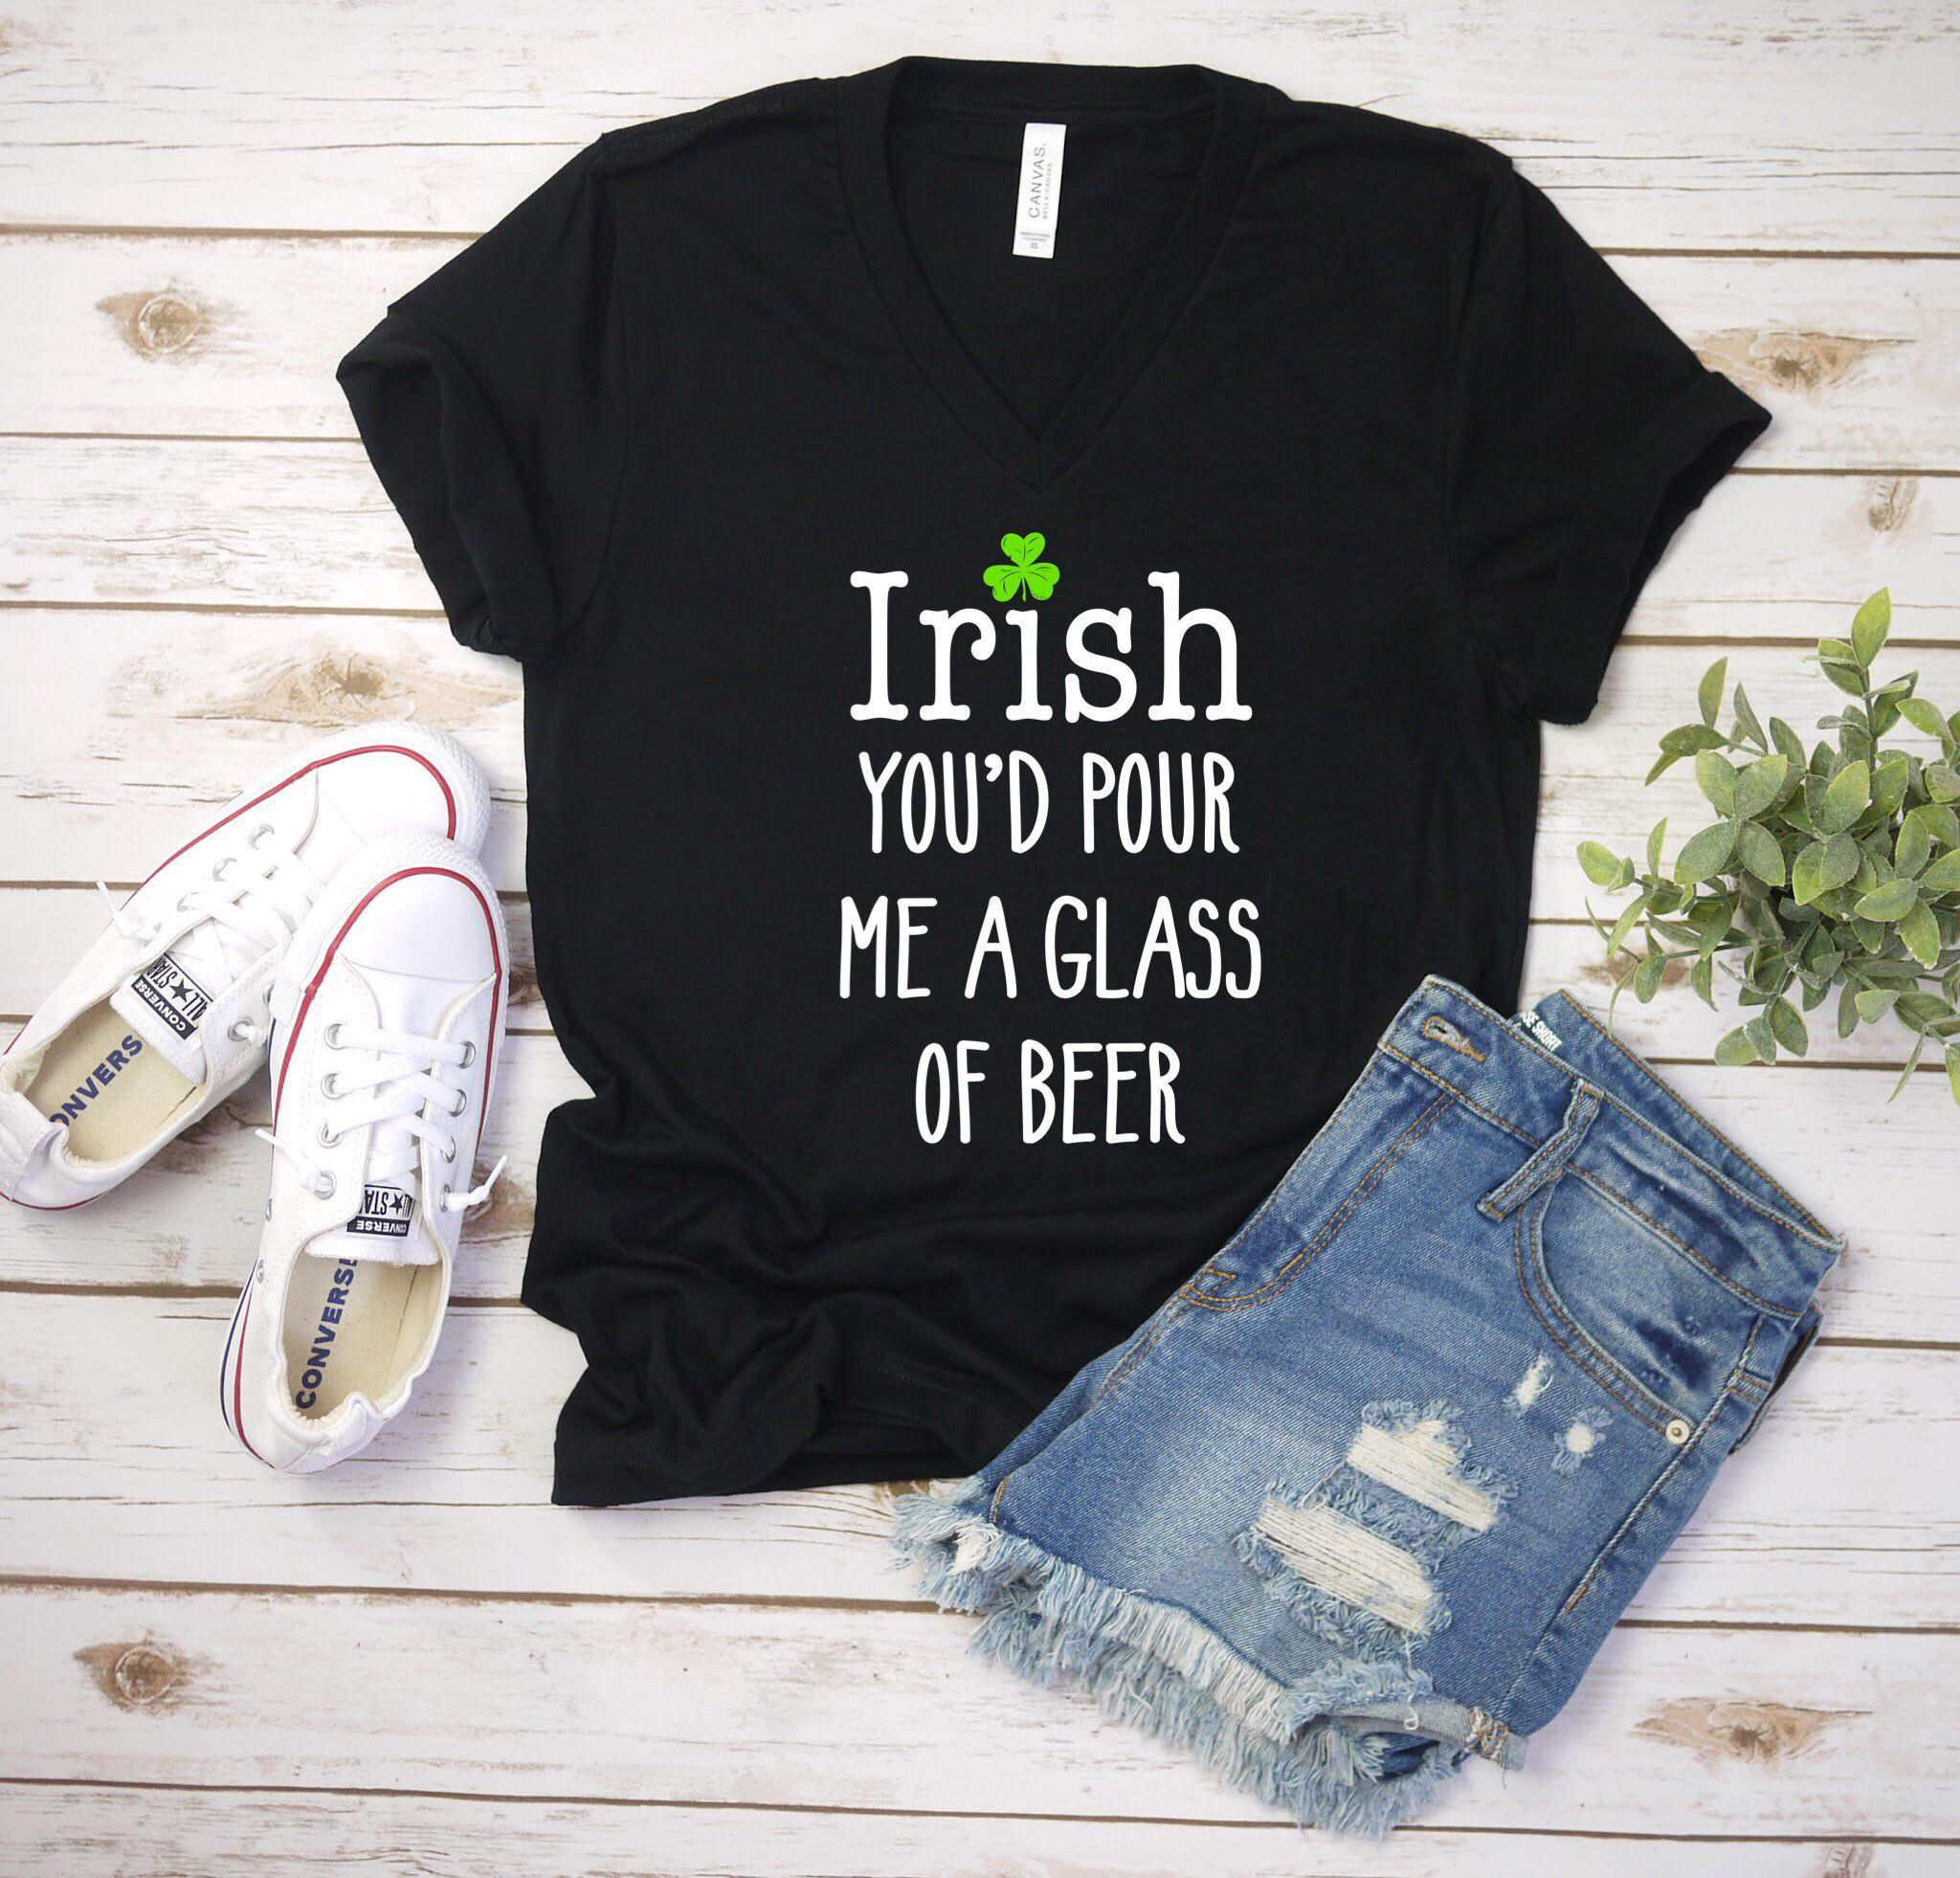 I Love Shamrock Irish Beer Short-Sleeves Tshirts Baby Girls